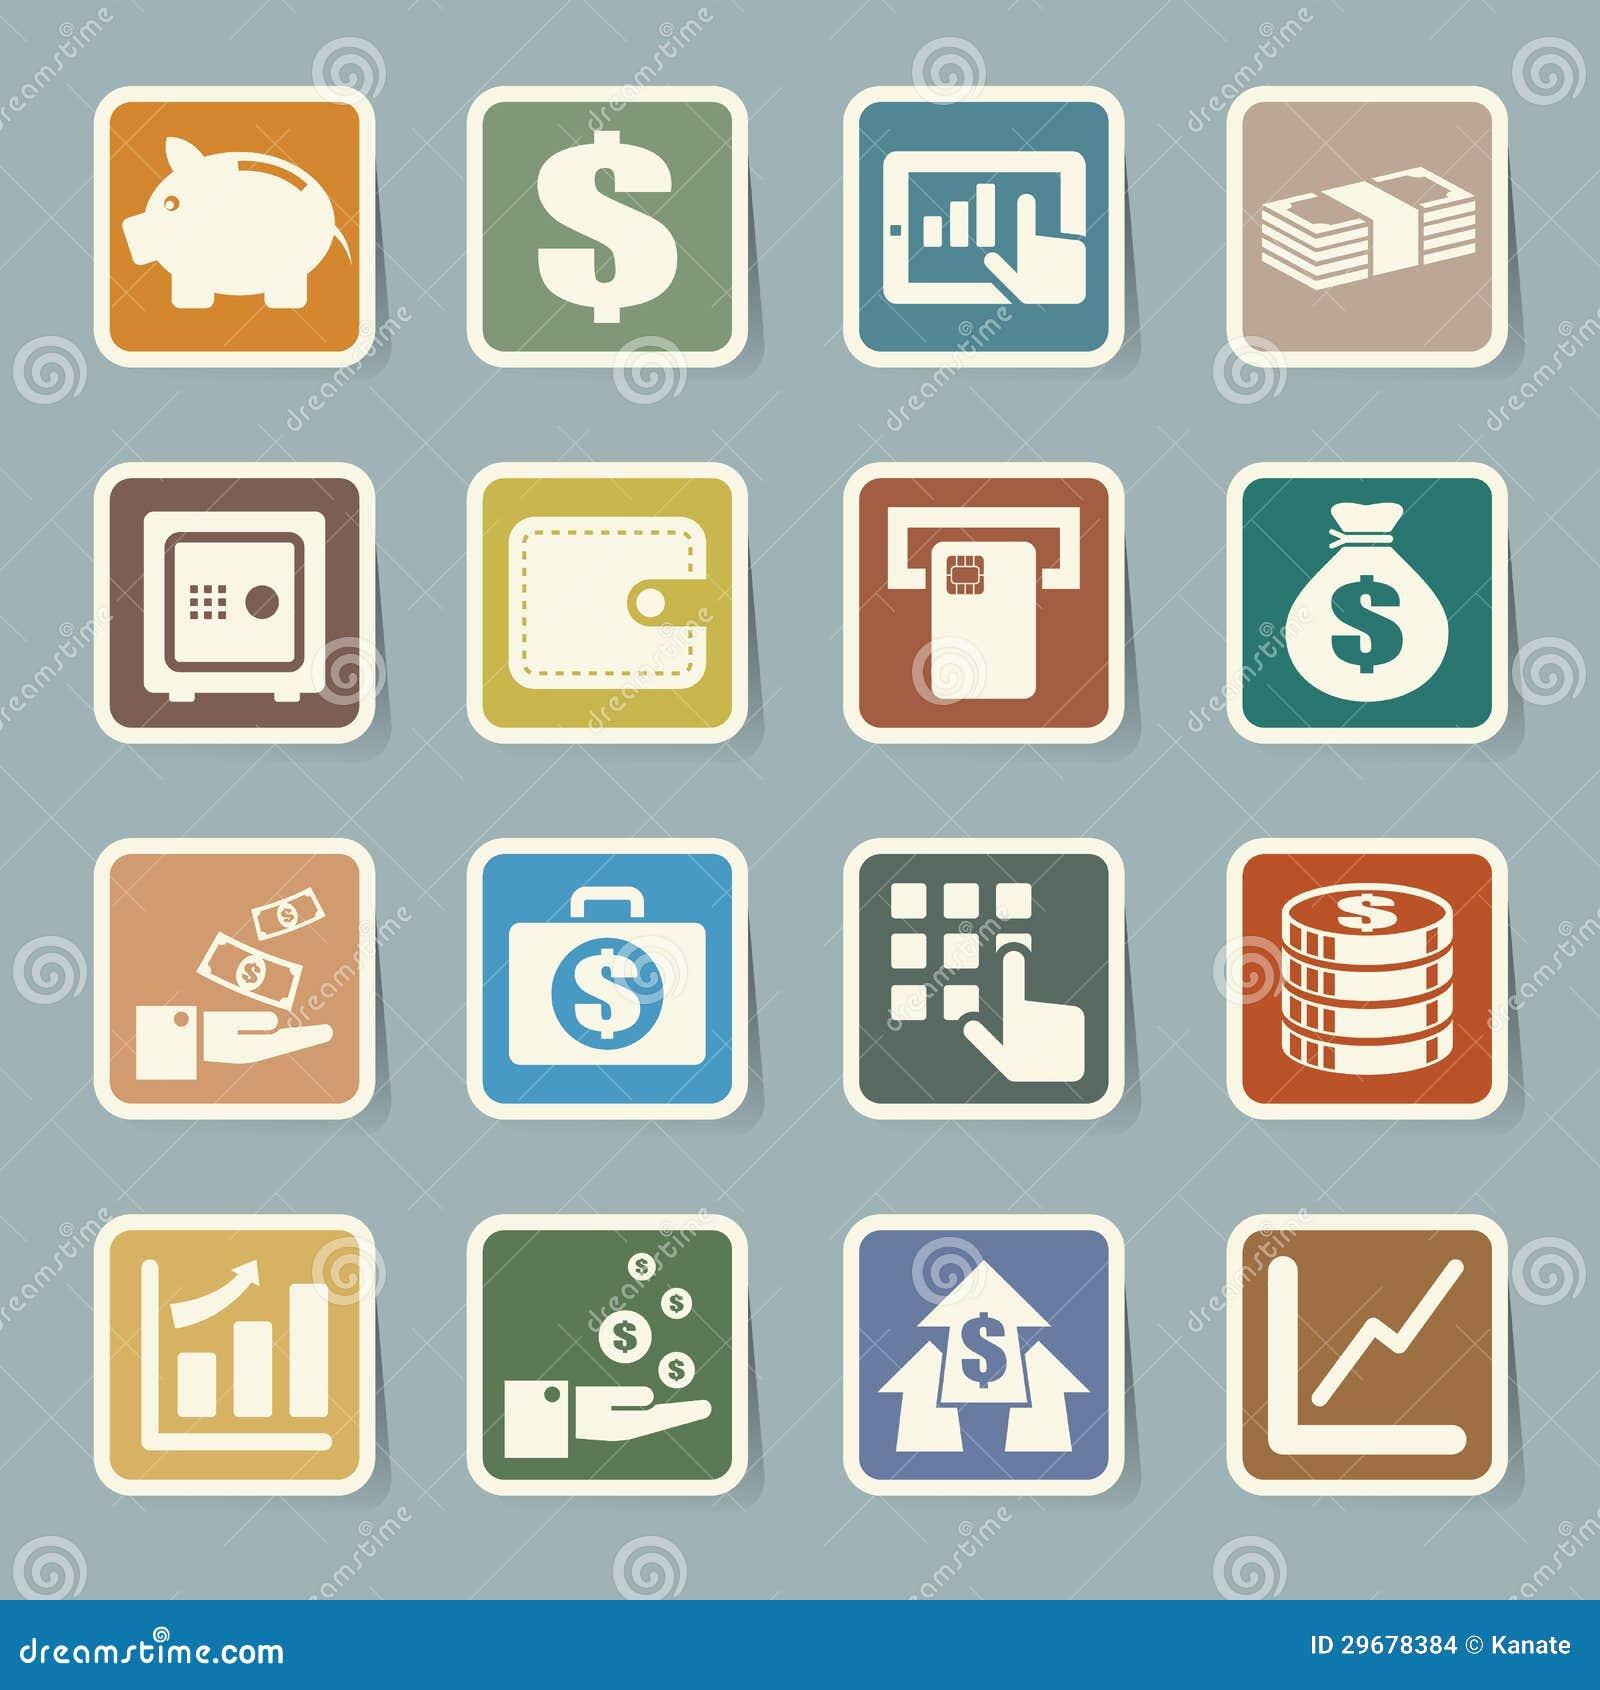 Finance Icon Set: Finance Money Icon Set, Vector Illustration